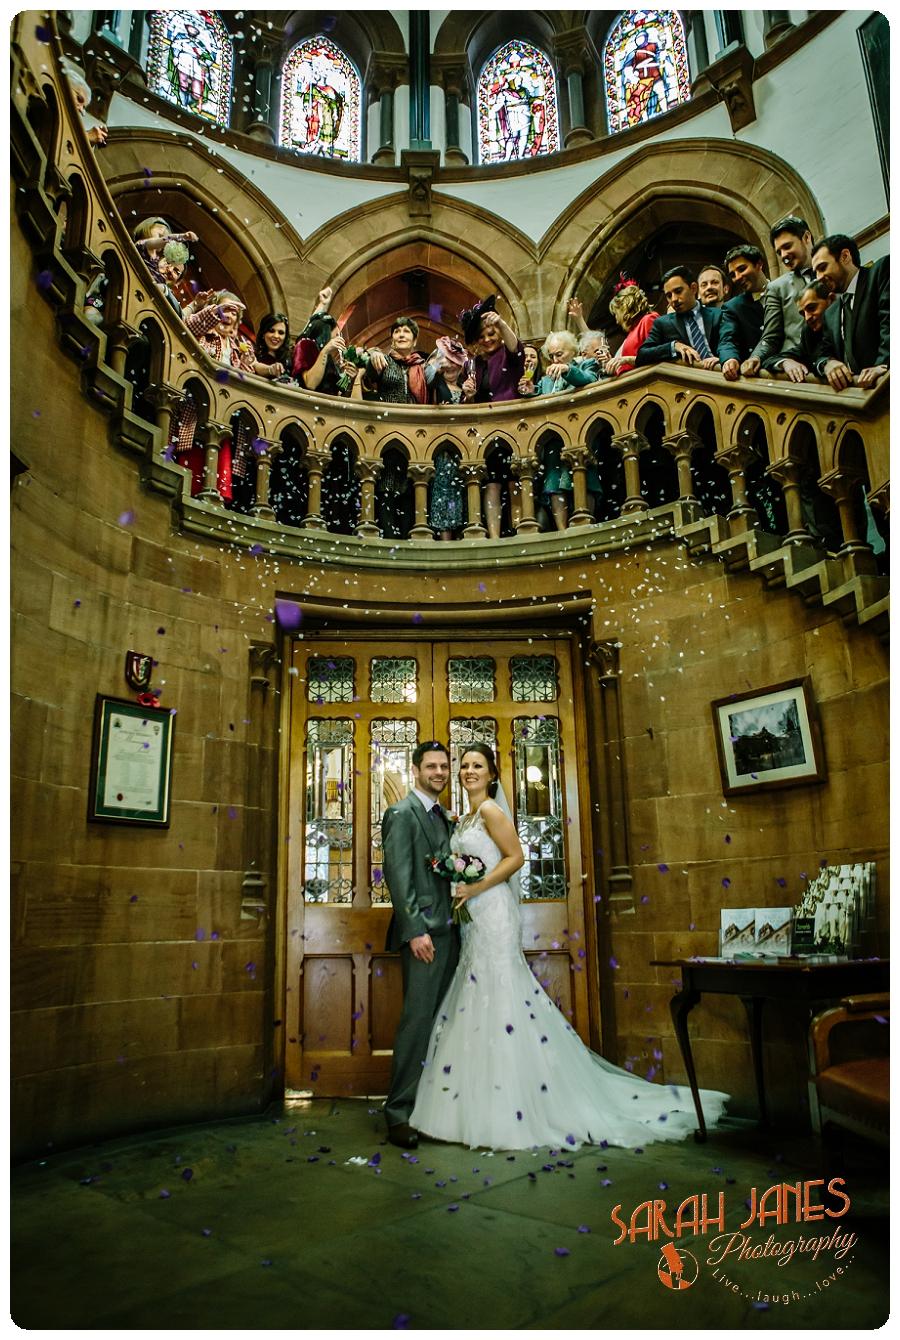 Wedding photography Chester, Weddings Rowton Hall, Wedding photography at Rowton Hall, Sarah Janes Photograpphy_0021.jpg